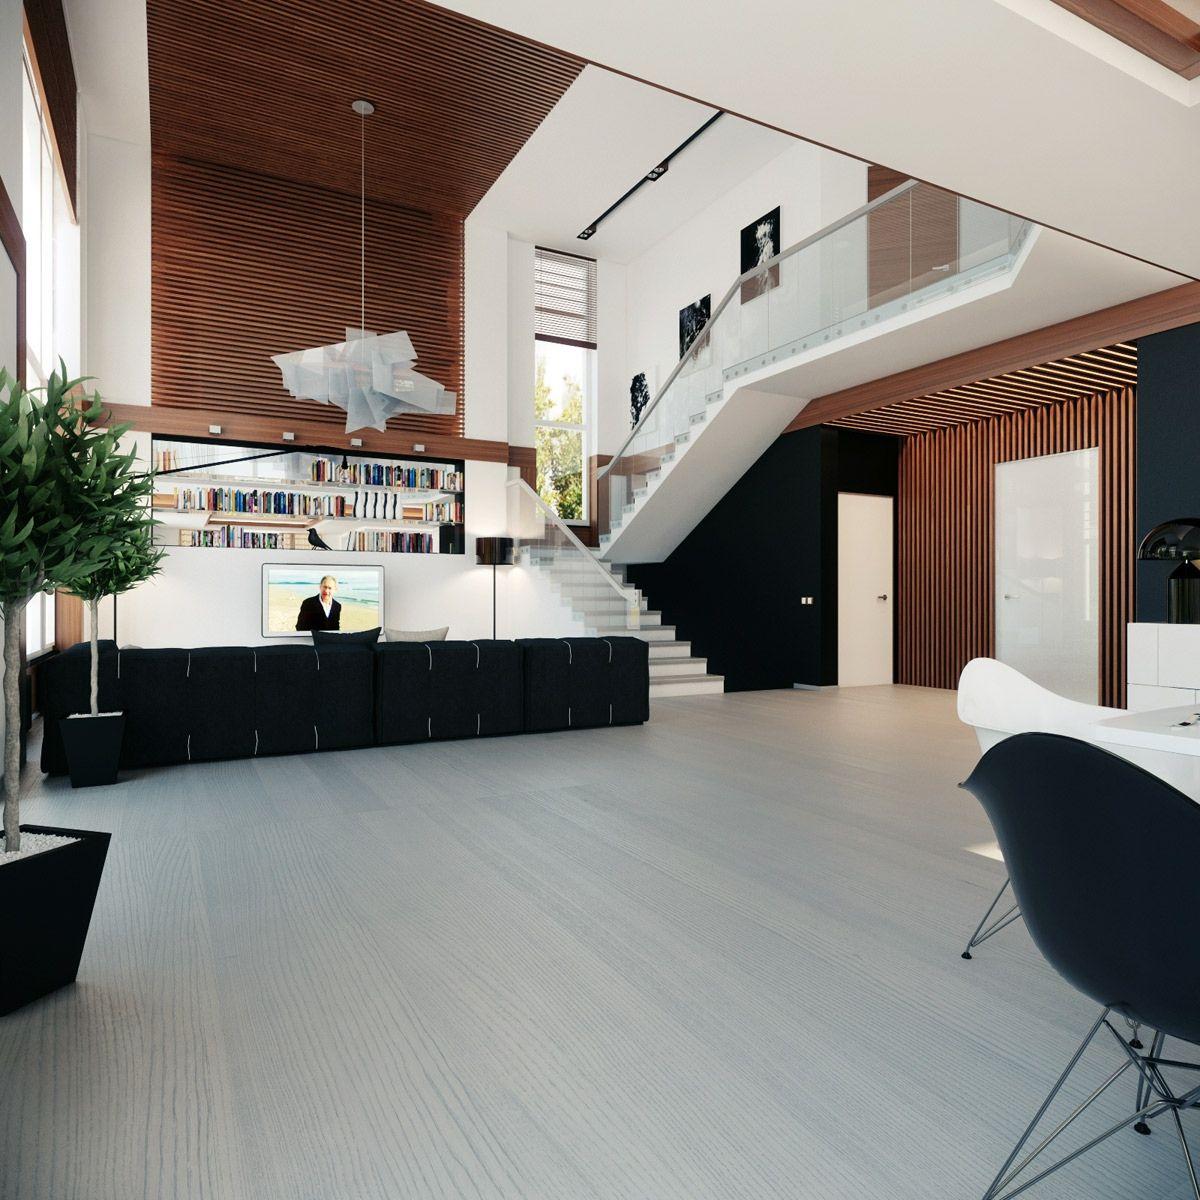 Open plan home design | - architecture pins - | Pinterest